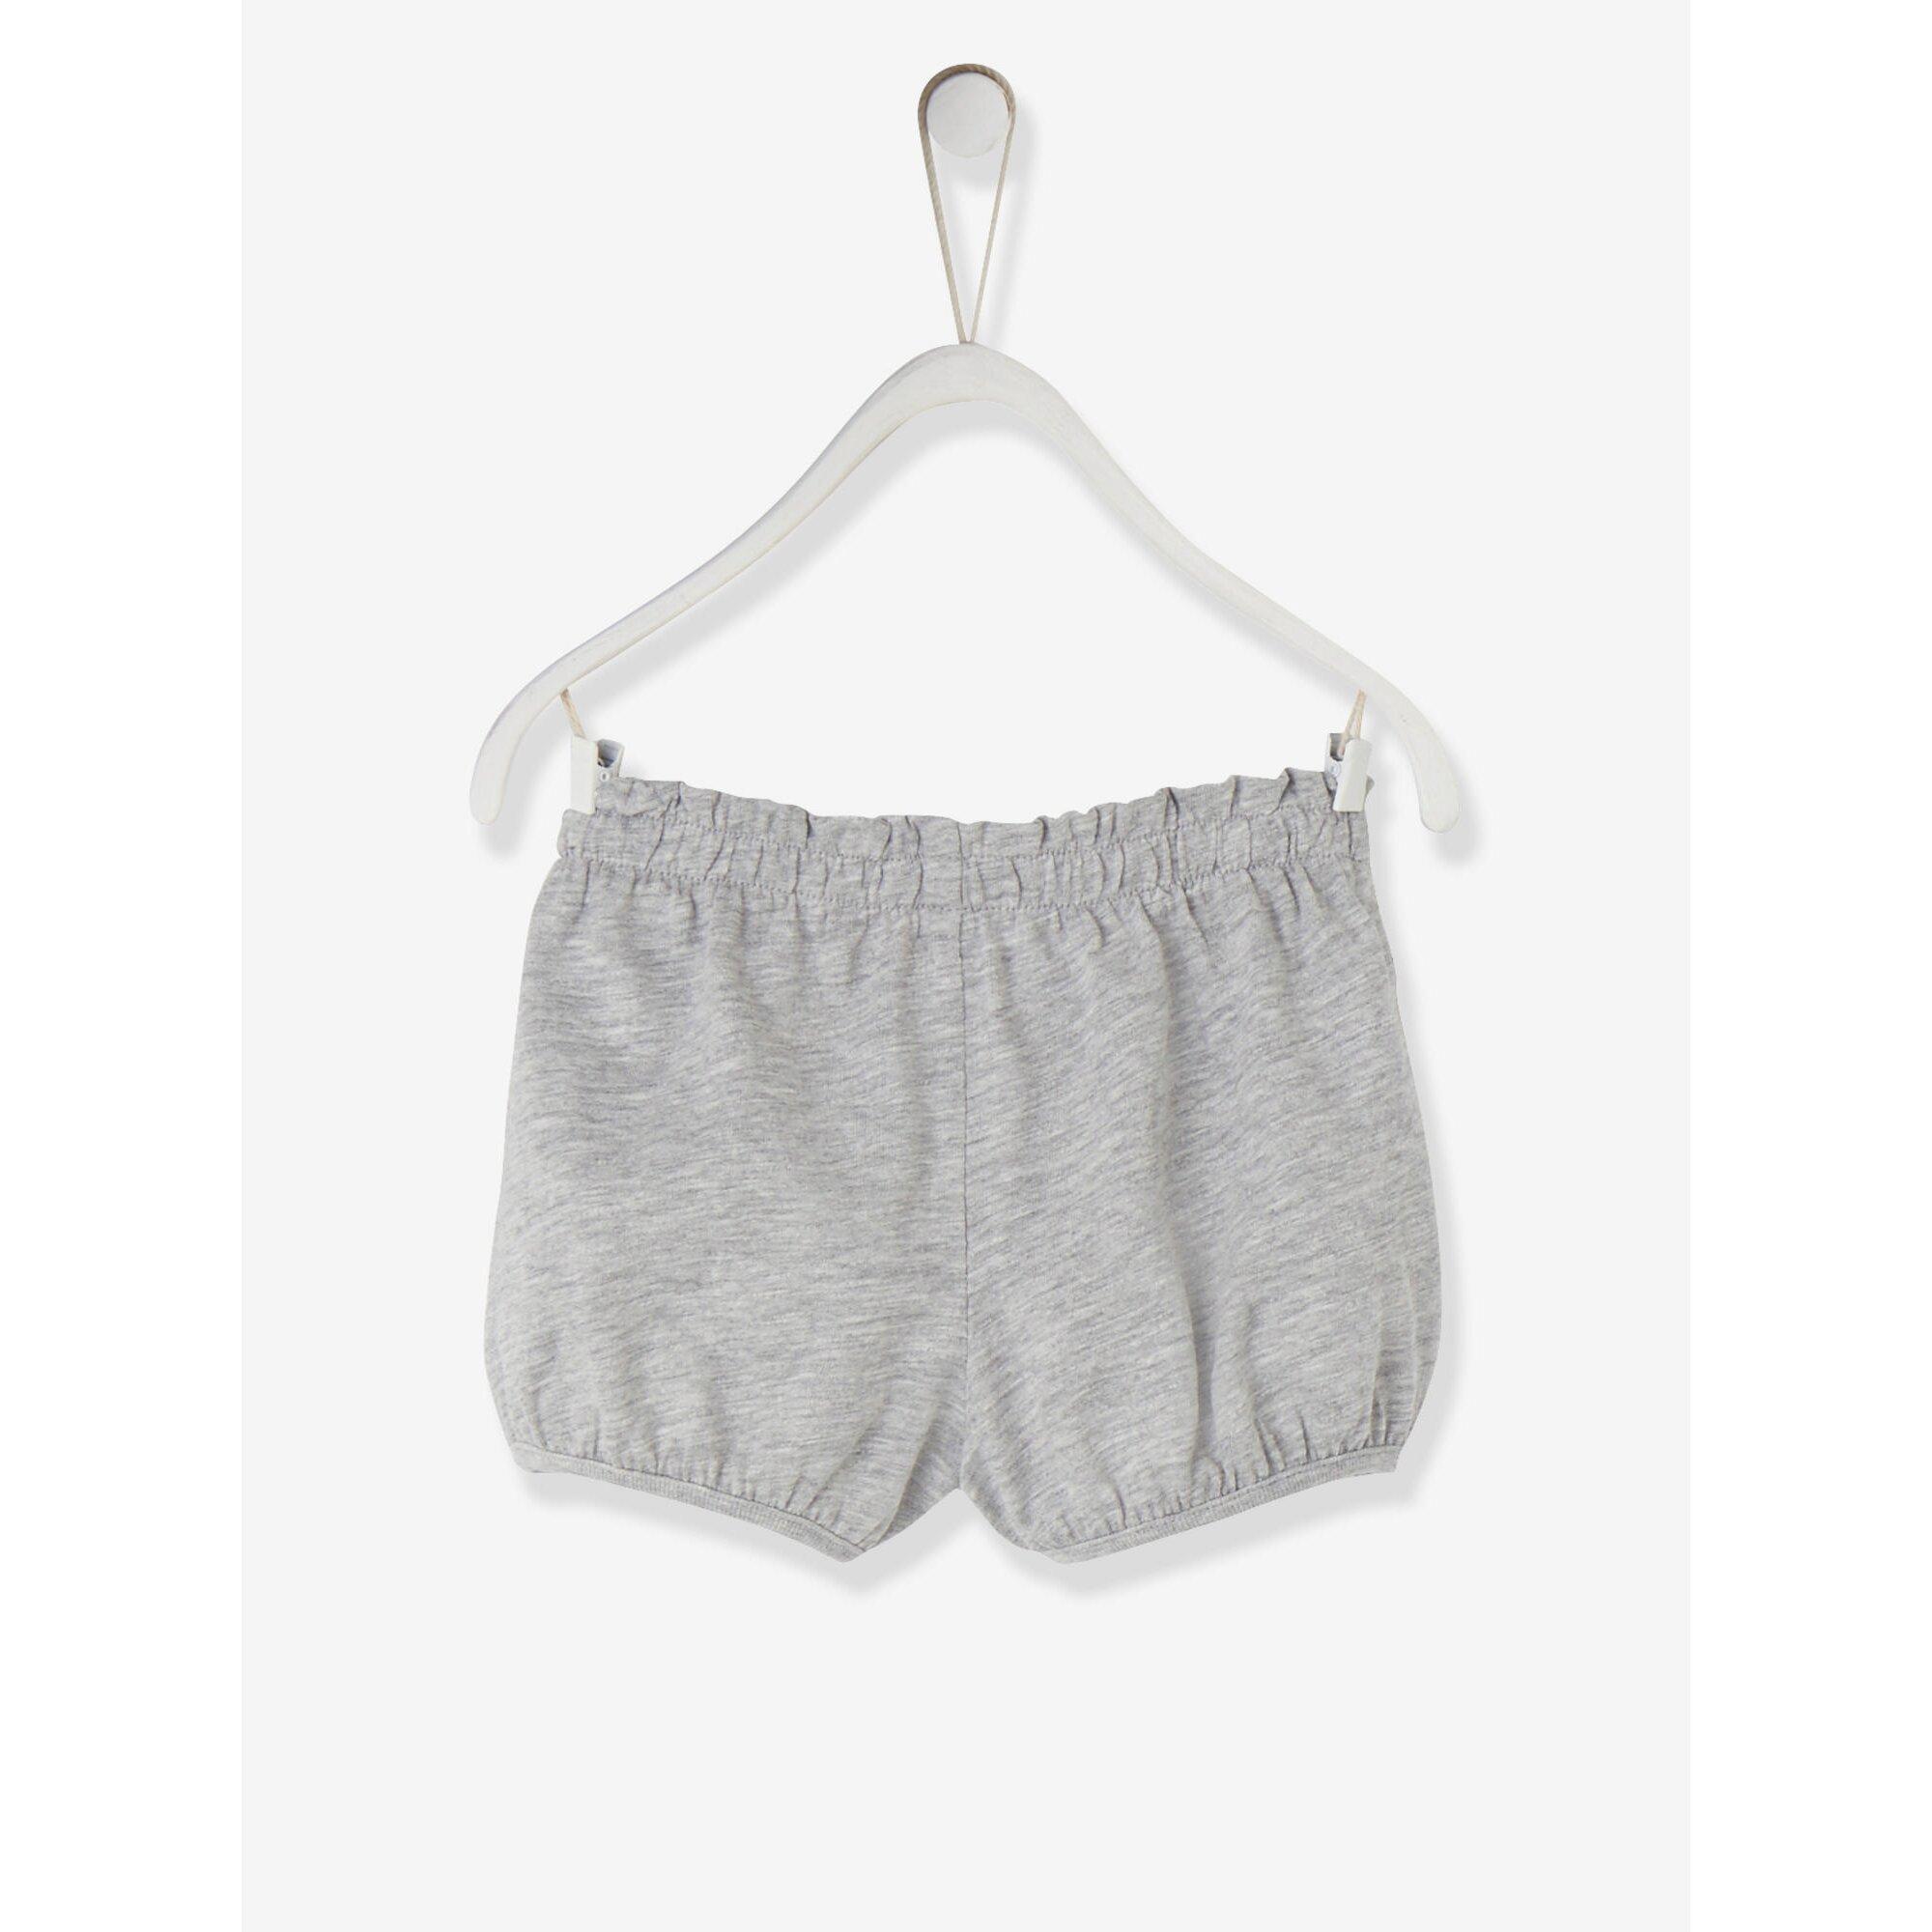 vertbaudet-baby-madchen-shorts-jersey, 6.99 EUR @ babywalz-de